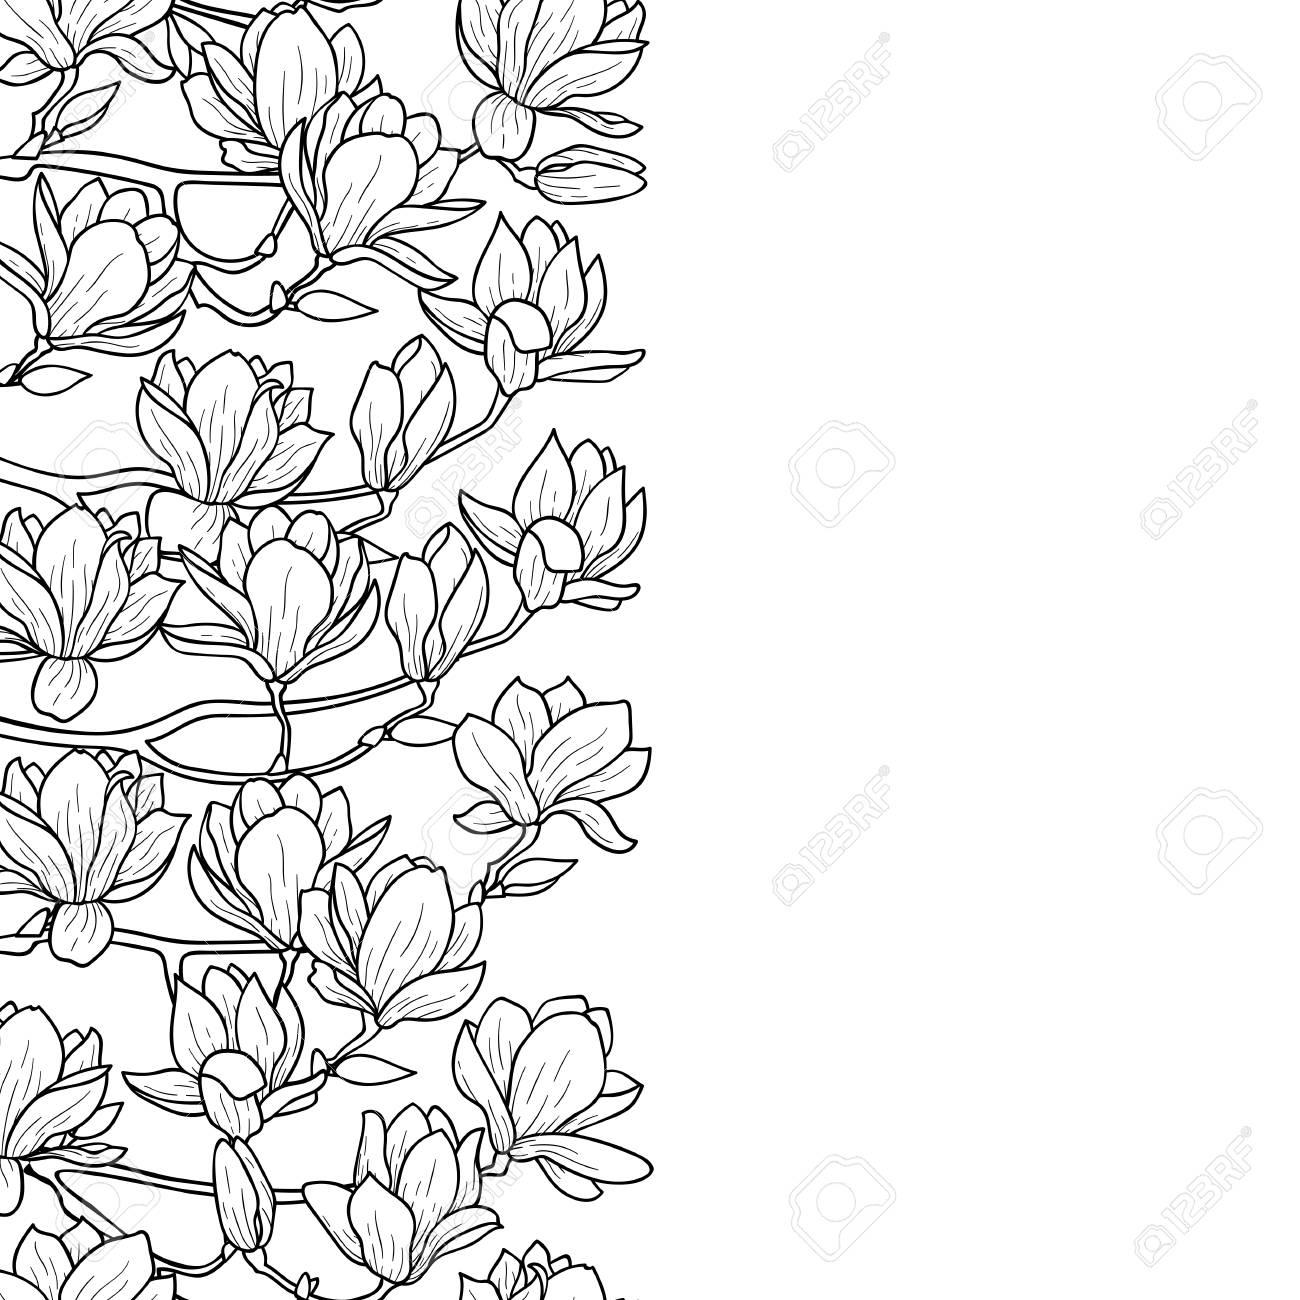 Magnolia Outline Seamless Border. Floral Romantic Wallpaper For ...